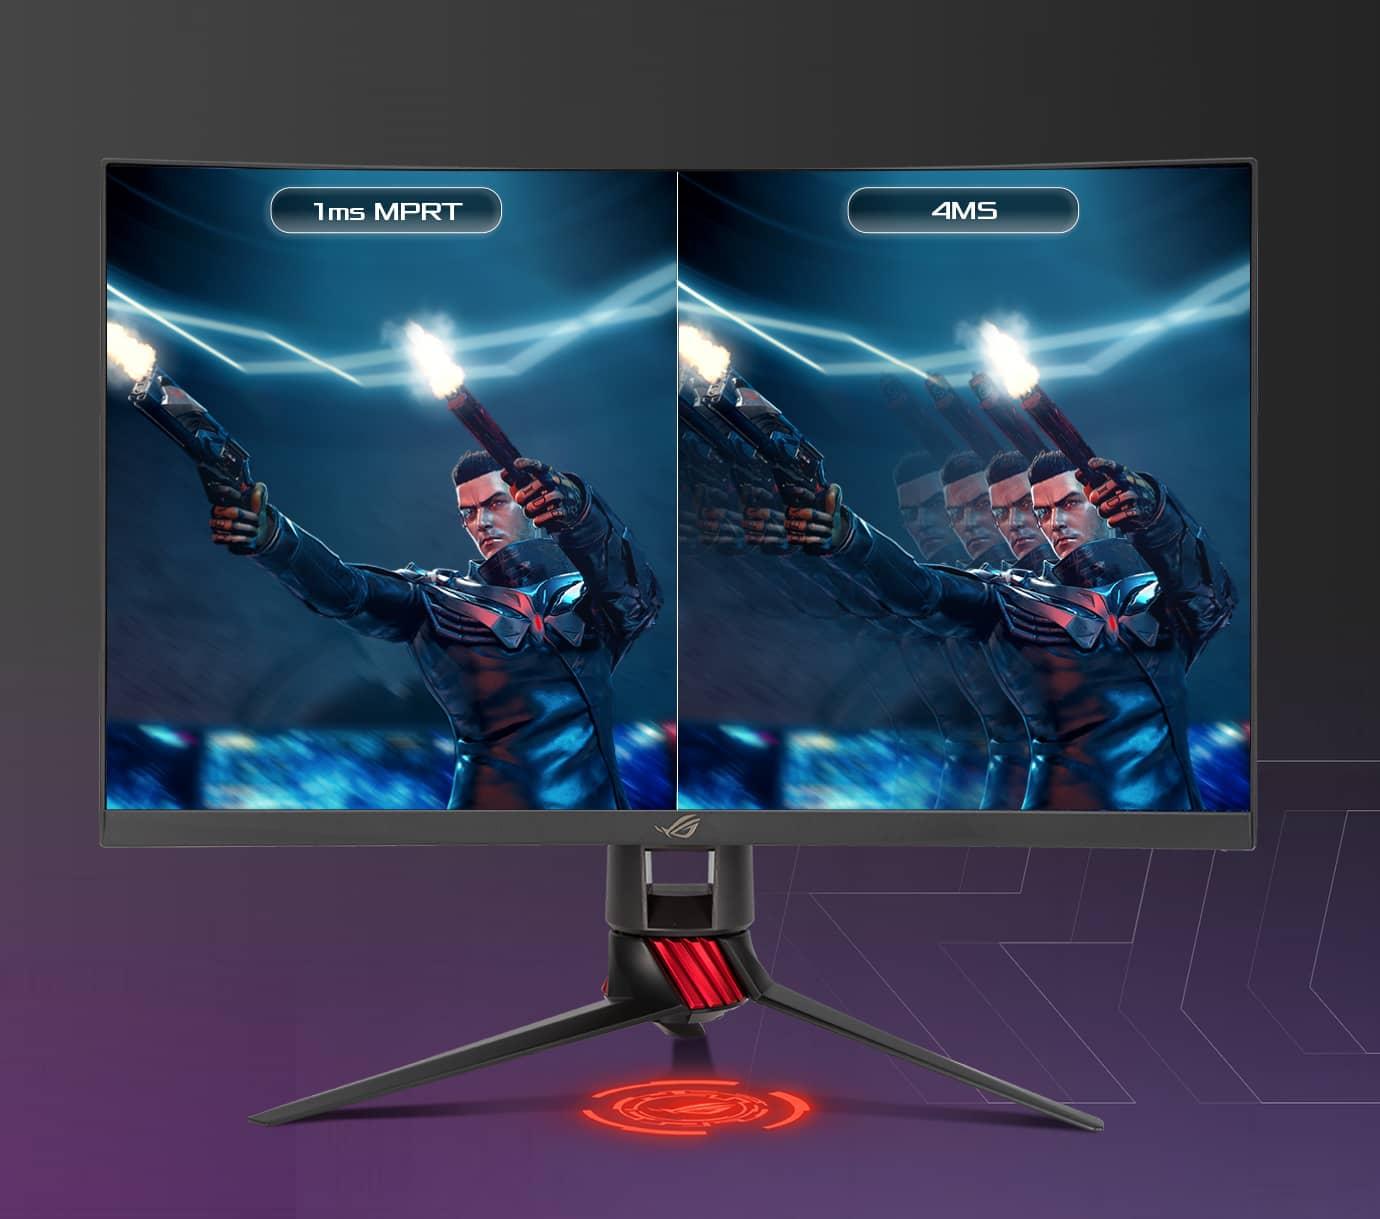 asus-27-xg27wq-1ms-165hz-freesync-wqhd-curved-gaming-monitor-8